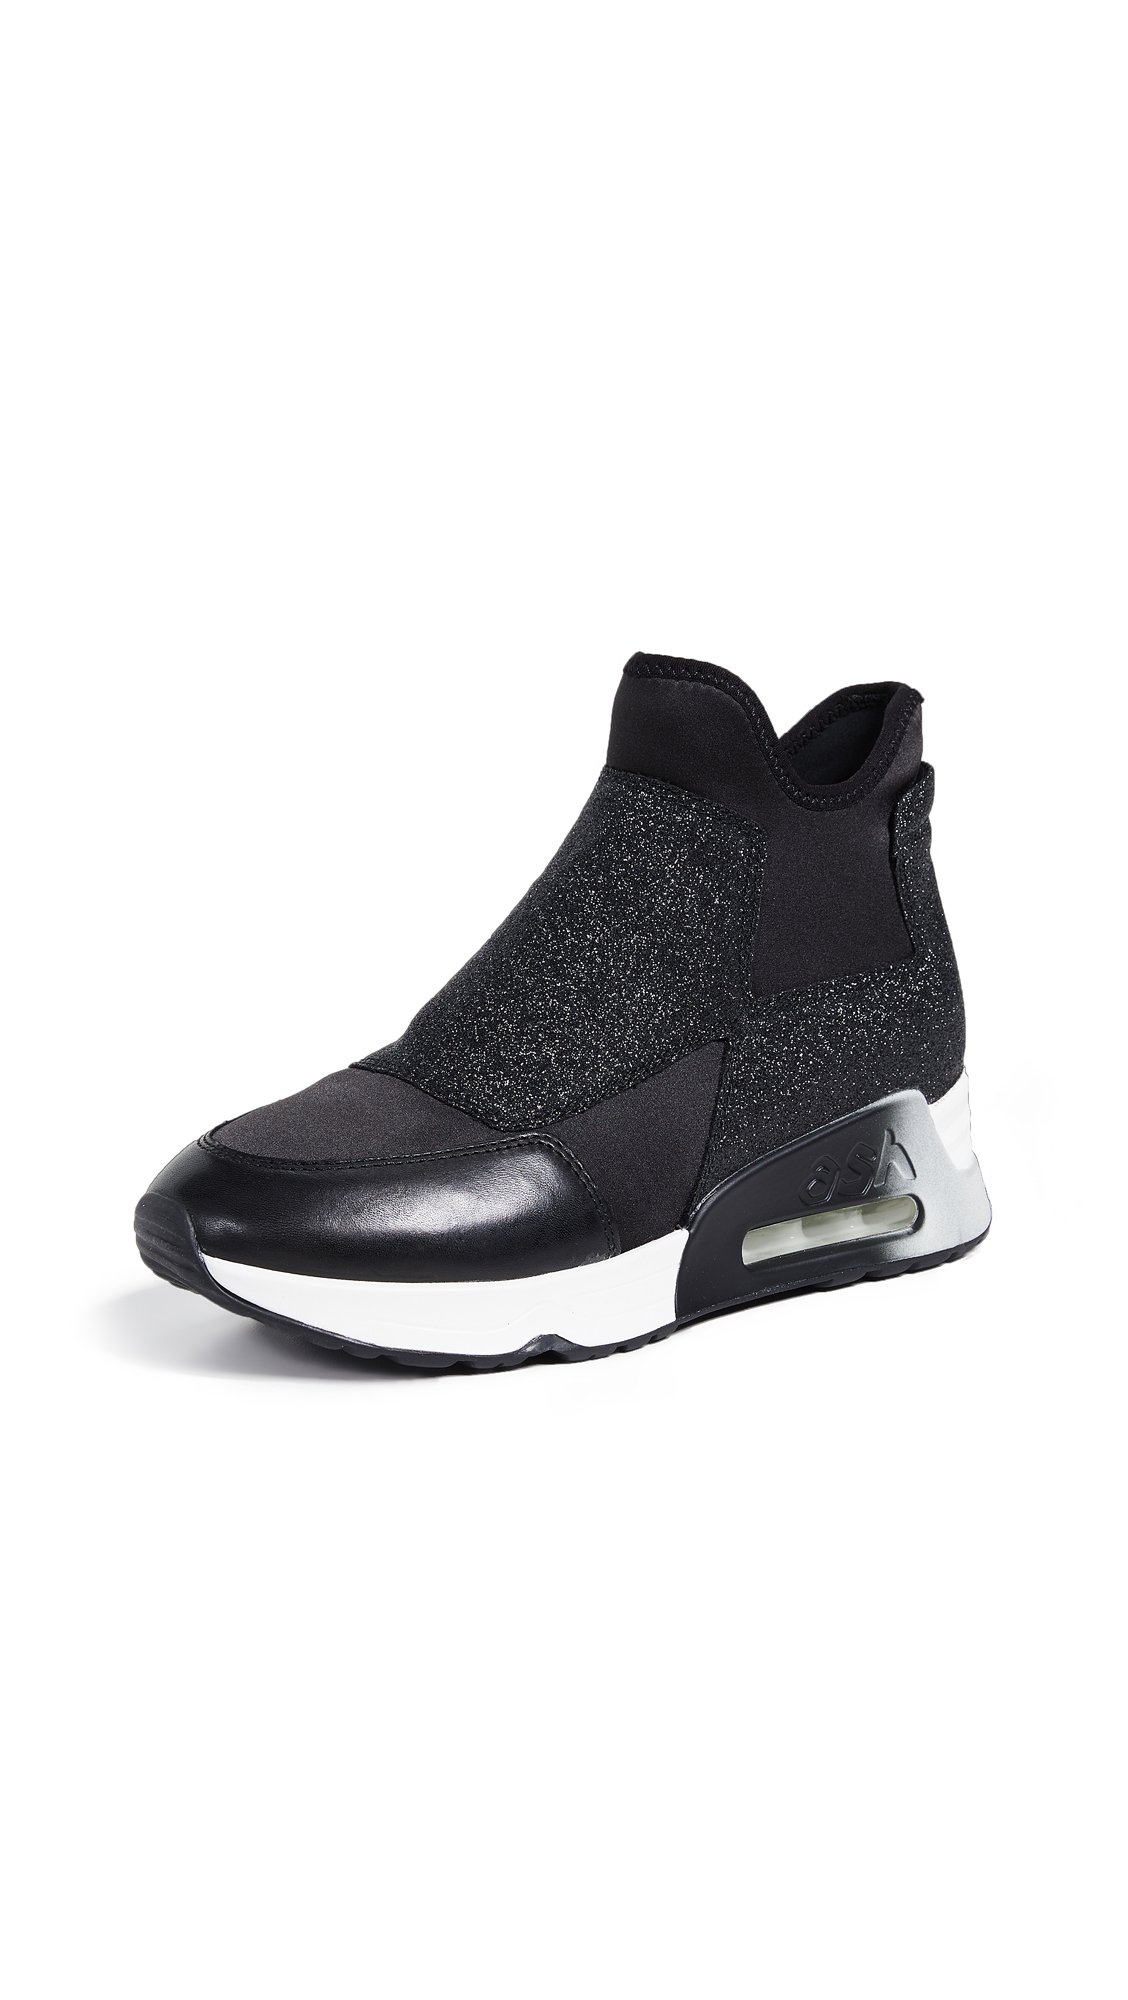 Ash Lazer Glitter Sneakers - Black/Black